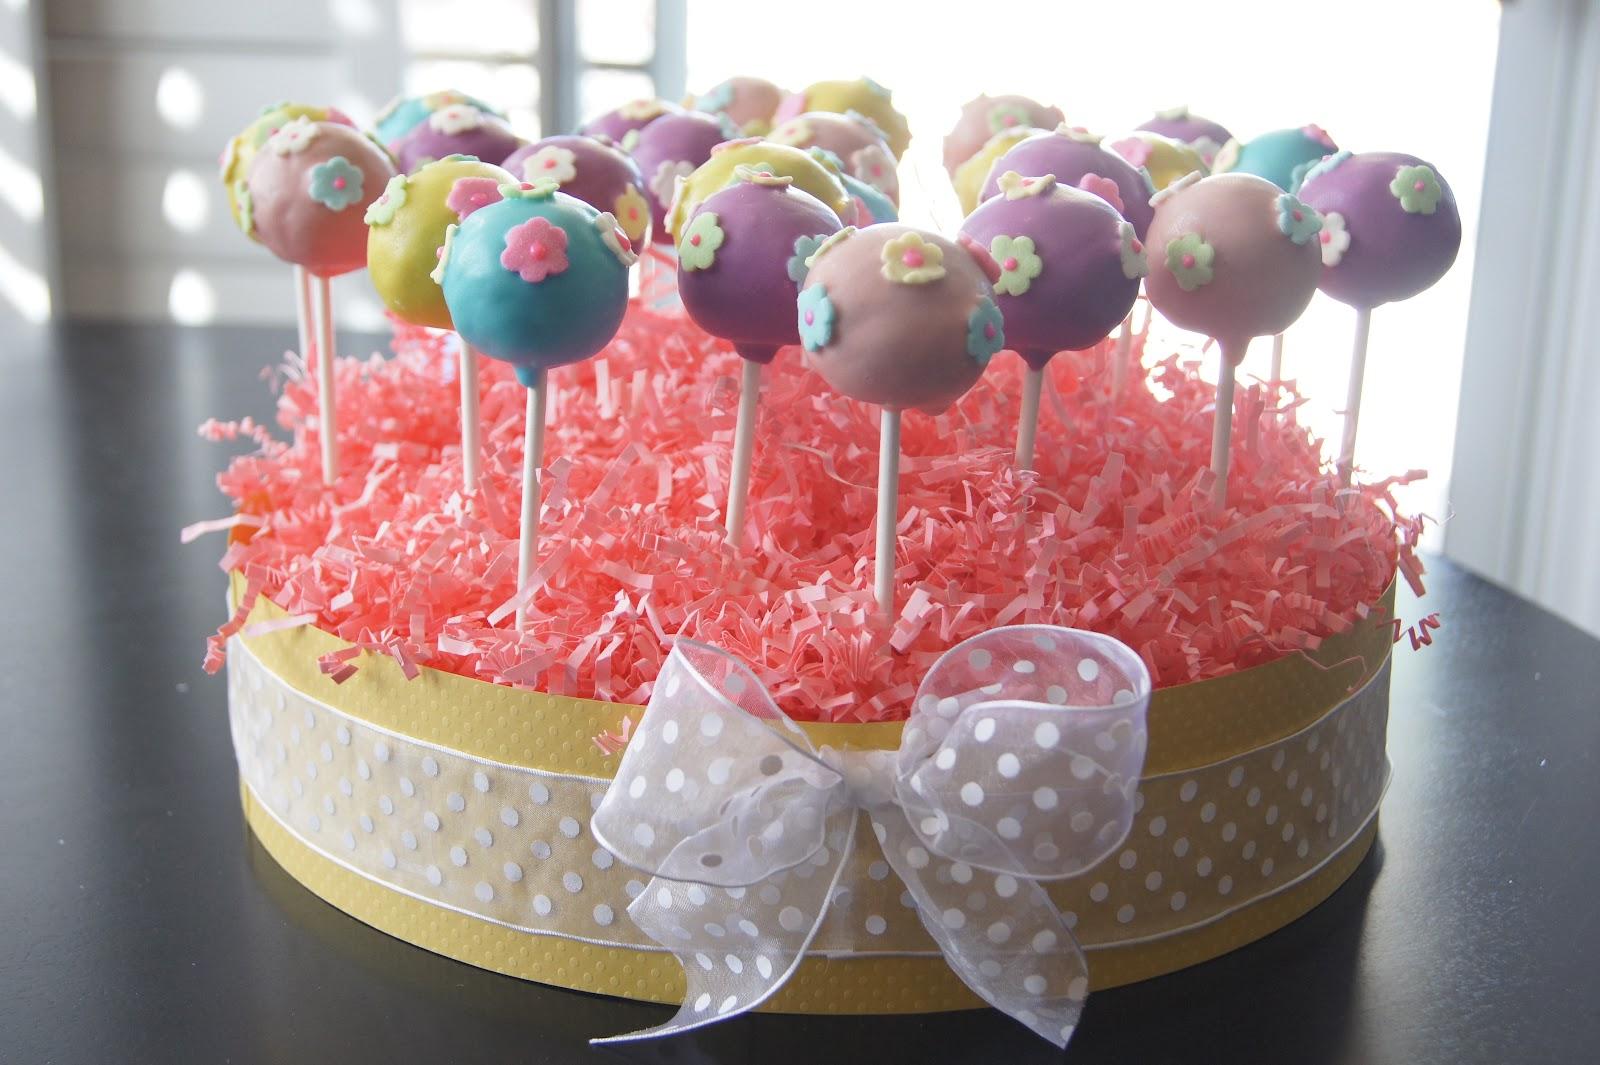 Christmas cake pop holder ideas